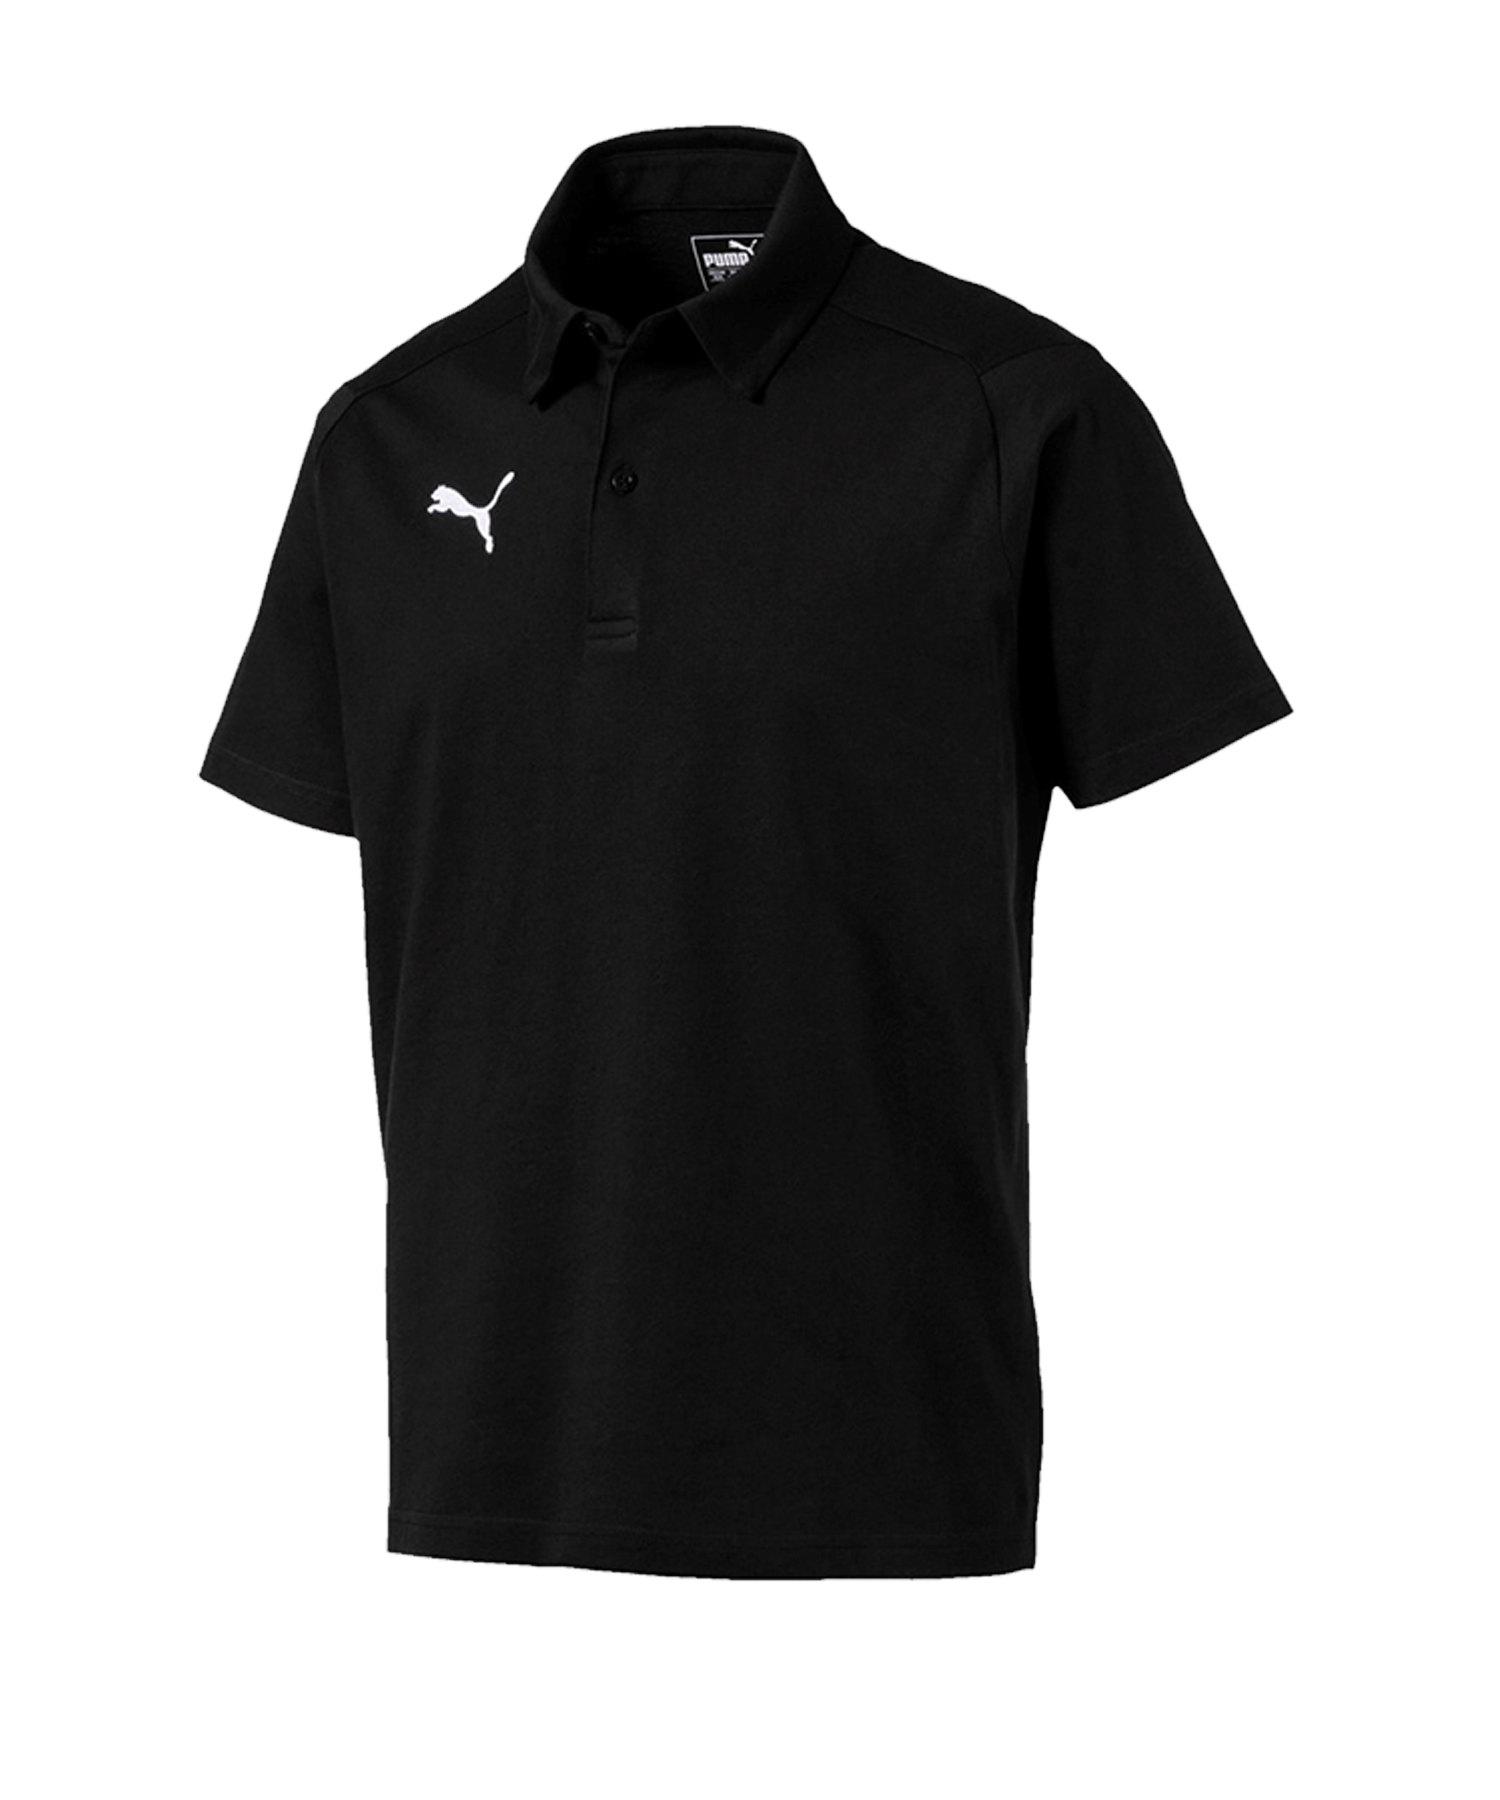 PUMA LIGA Casuals Poloshirt Schwarz F03 - schwarz